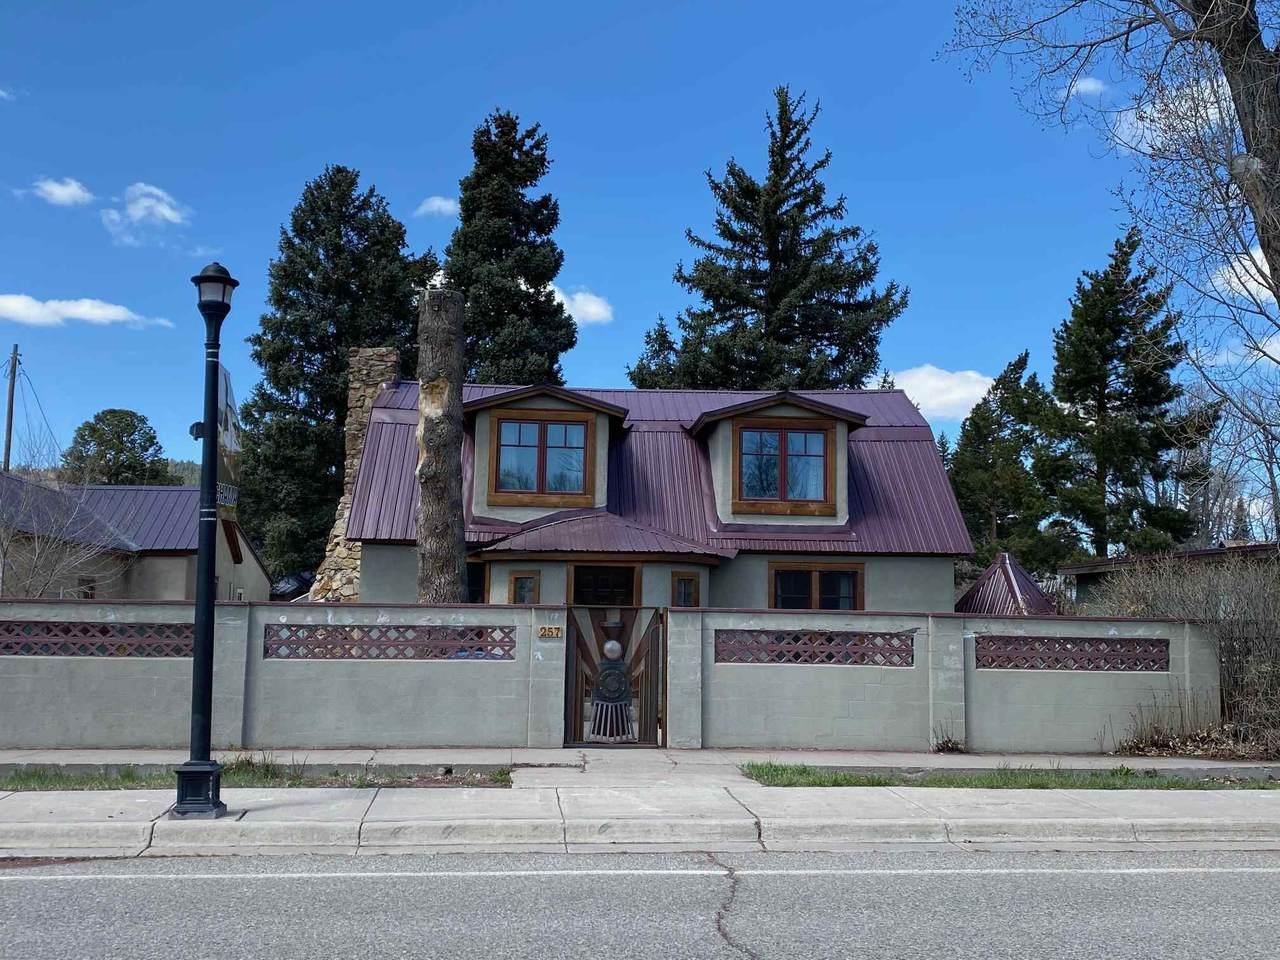 257 Terrace Ave - Photo 1